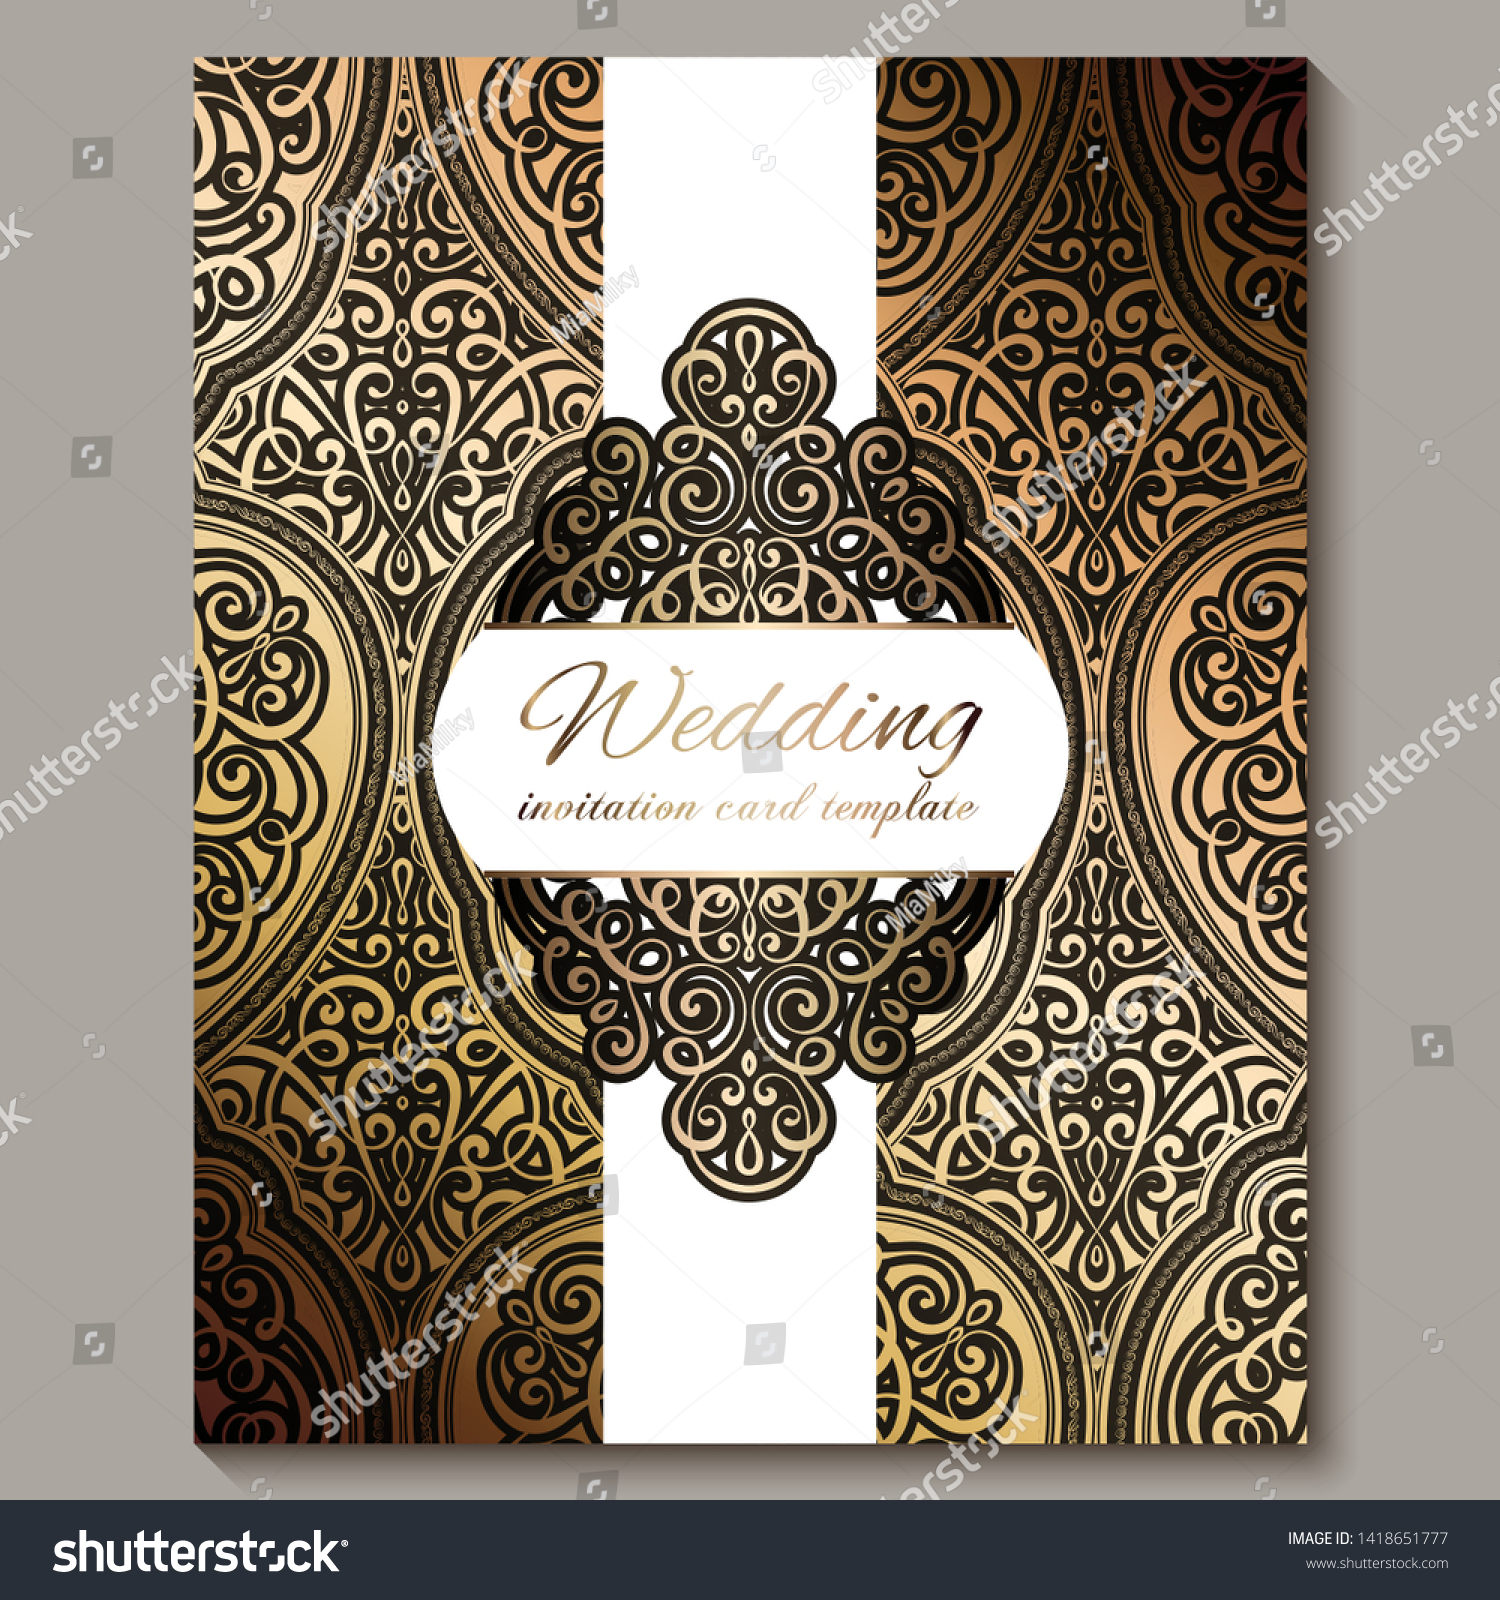 Wedding Invitation Card Black Gold Shiny Stock Vector (Royalty Free)  1418651777